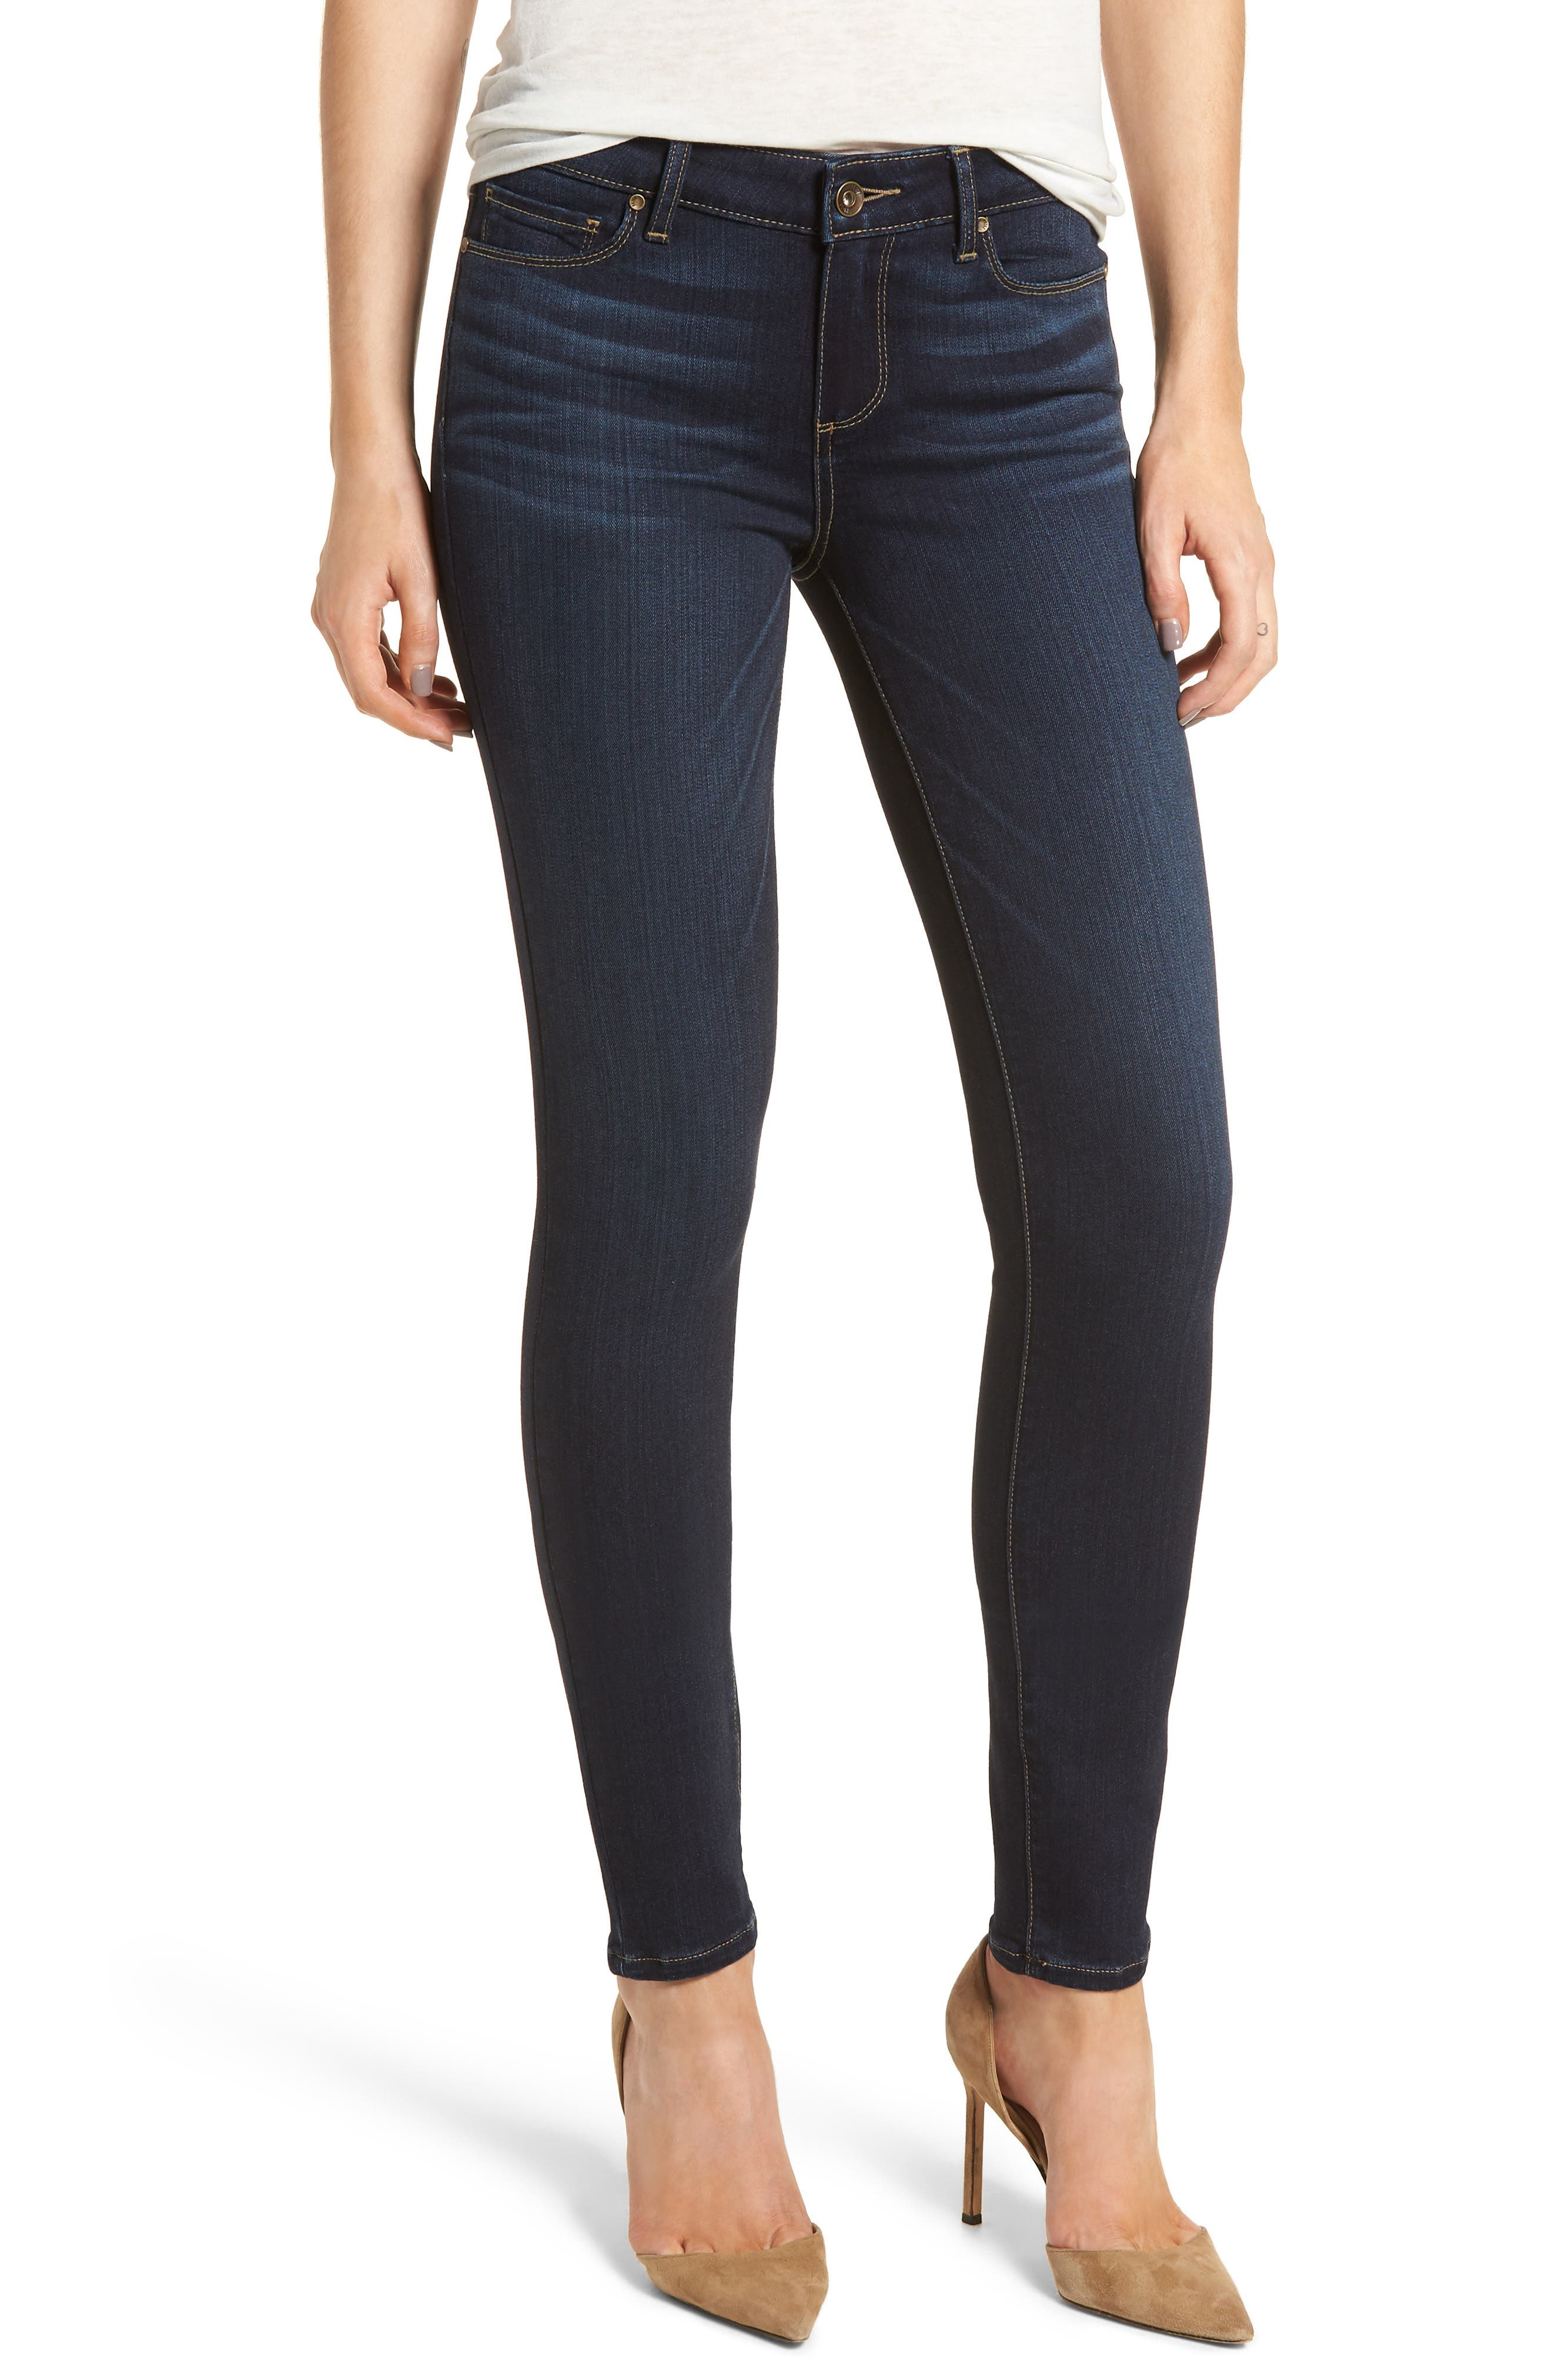 Transcend - Verdugo Ultra Skinny Jeans,                             Main thumbnail 1, color,                             Koda